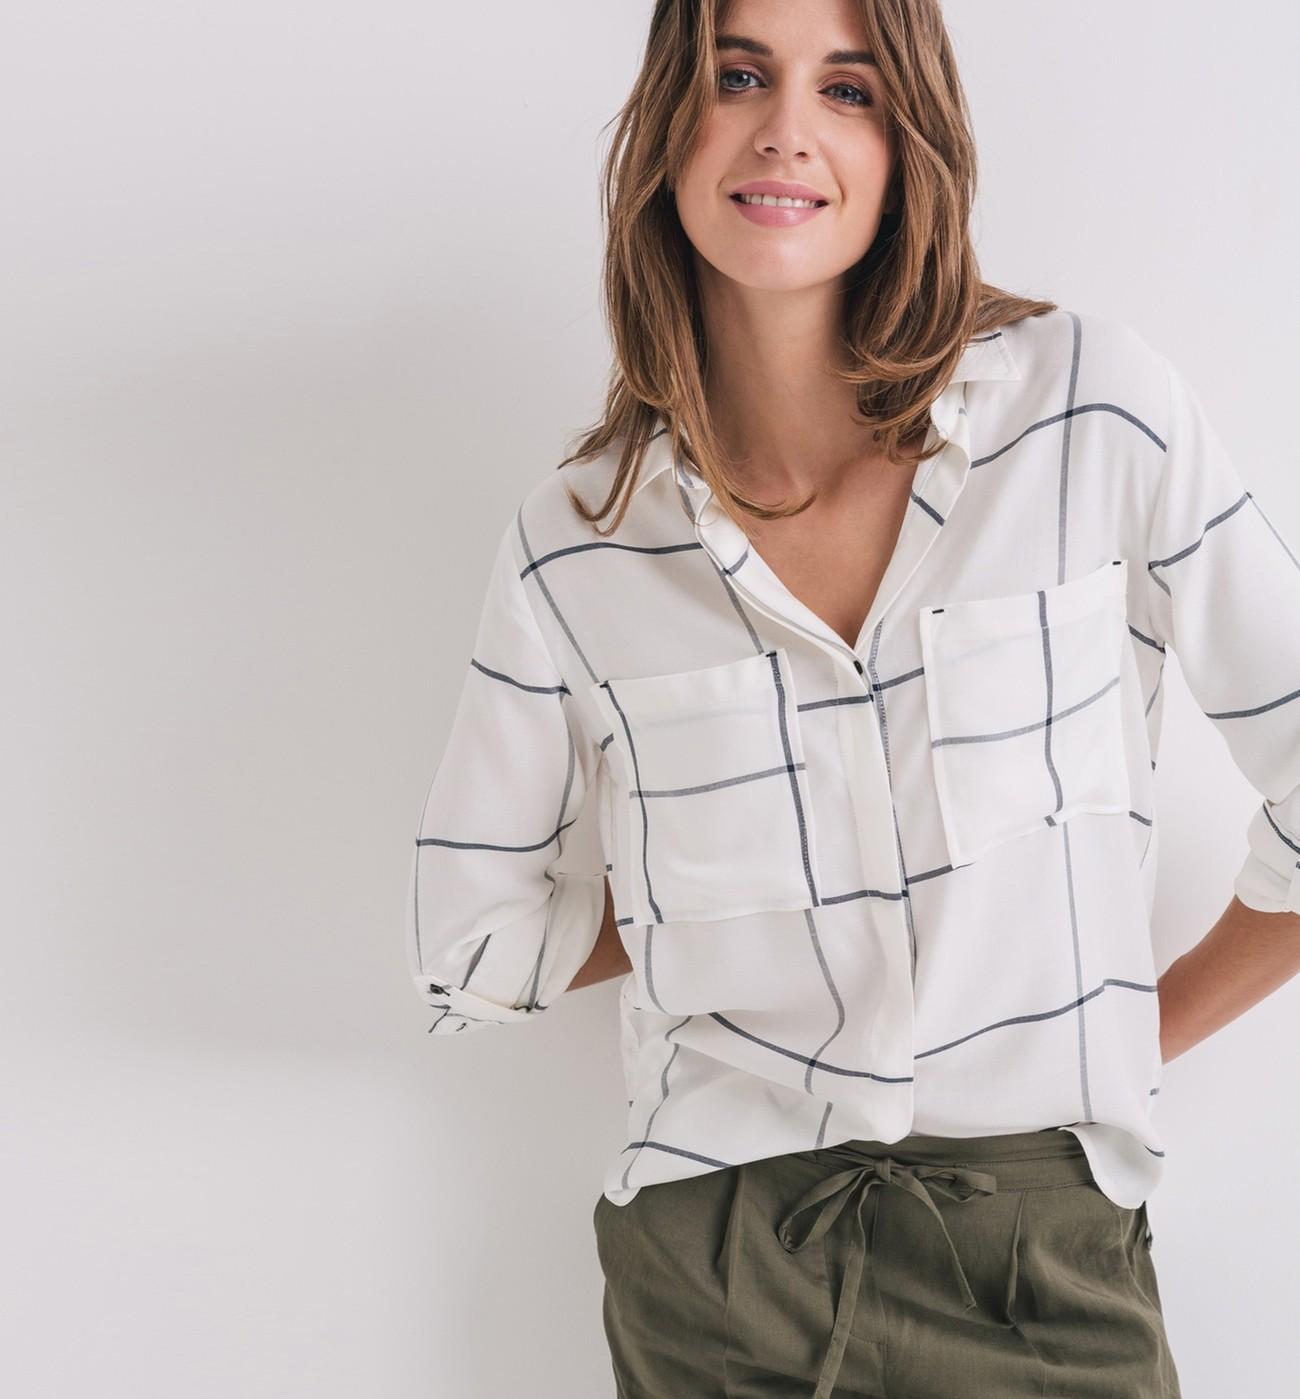 ... Модная рубашка 2018 ... 91ab8fccc1fa9